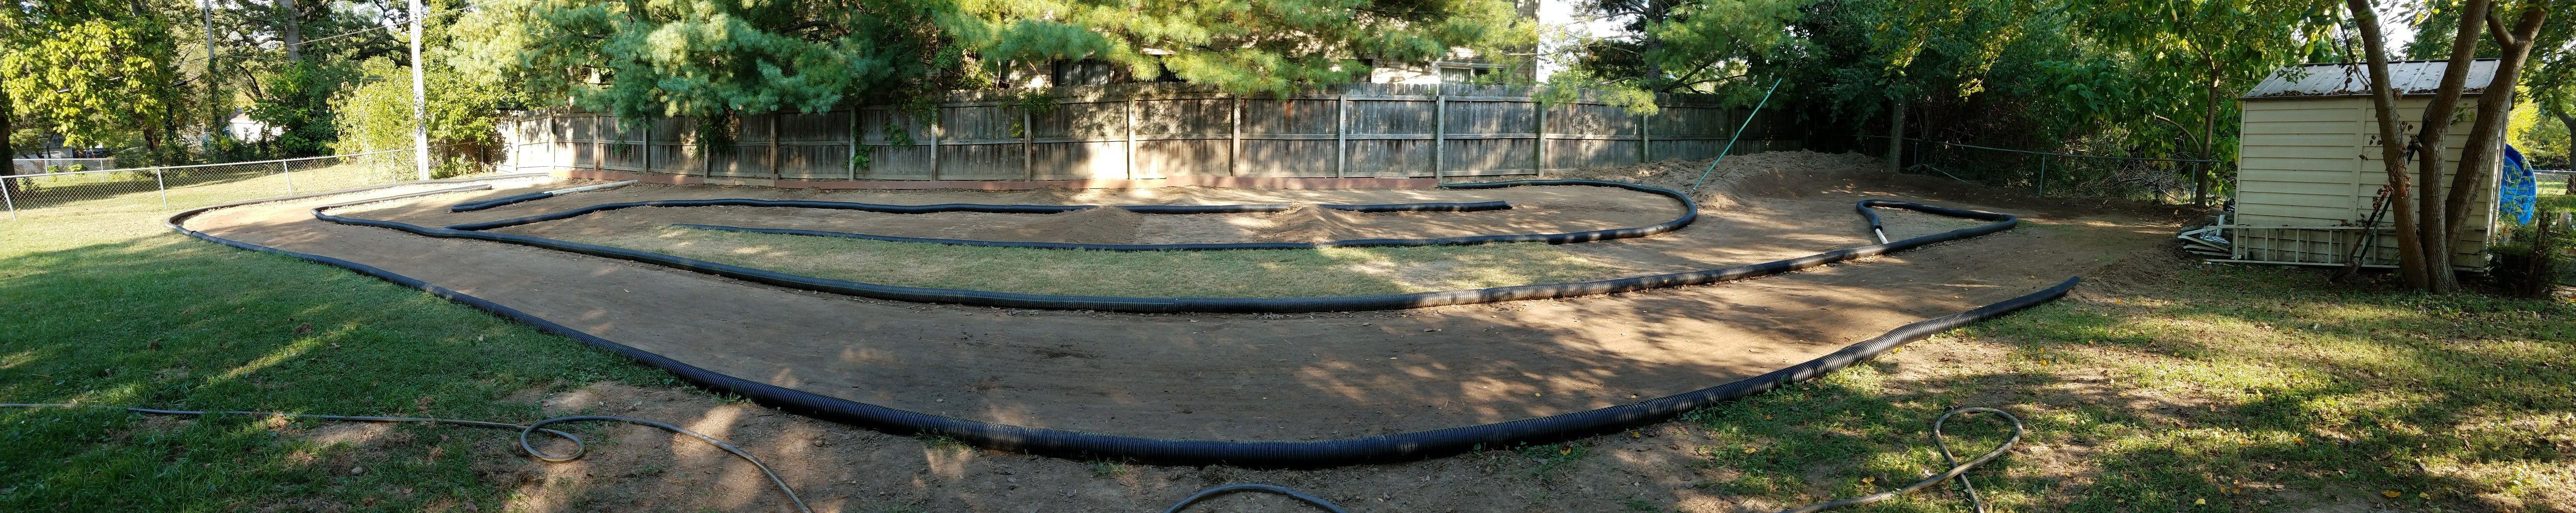 787001d1311779662 backyard track track jpg 1352 881 r c